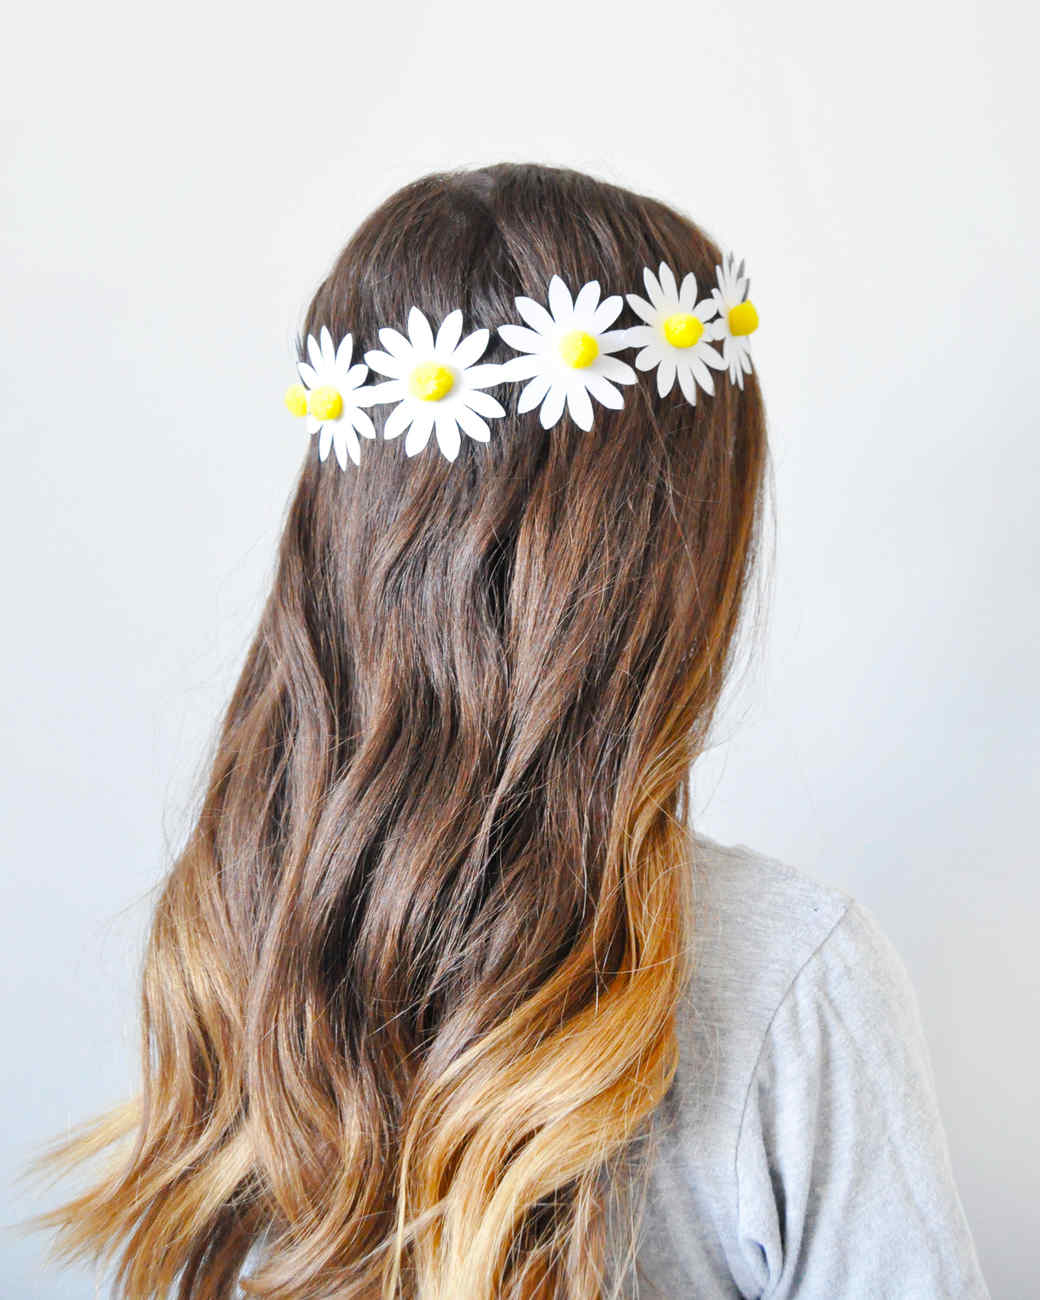 daisy chain craft on woman